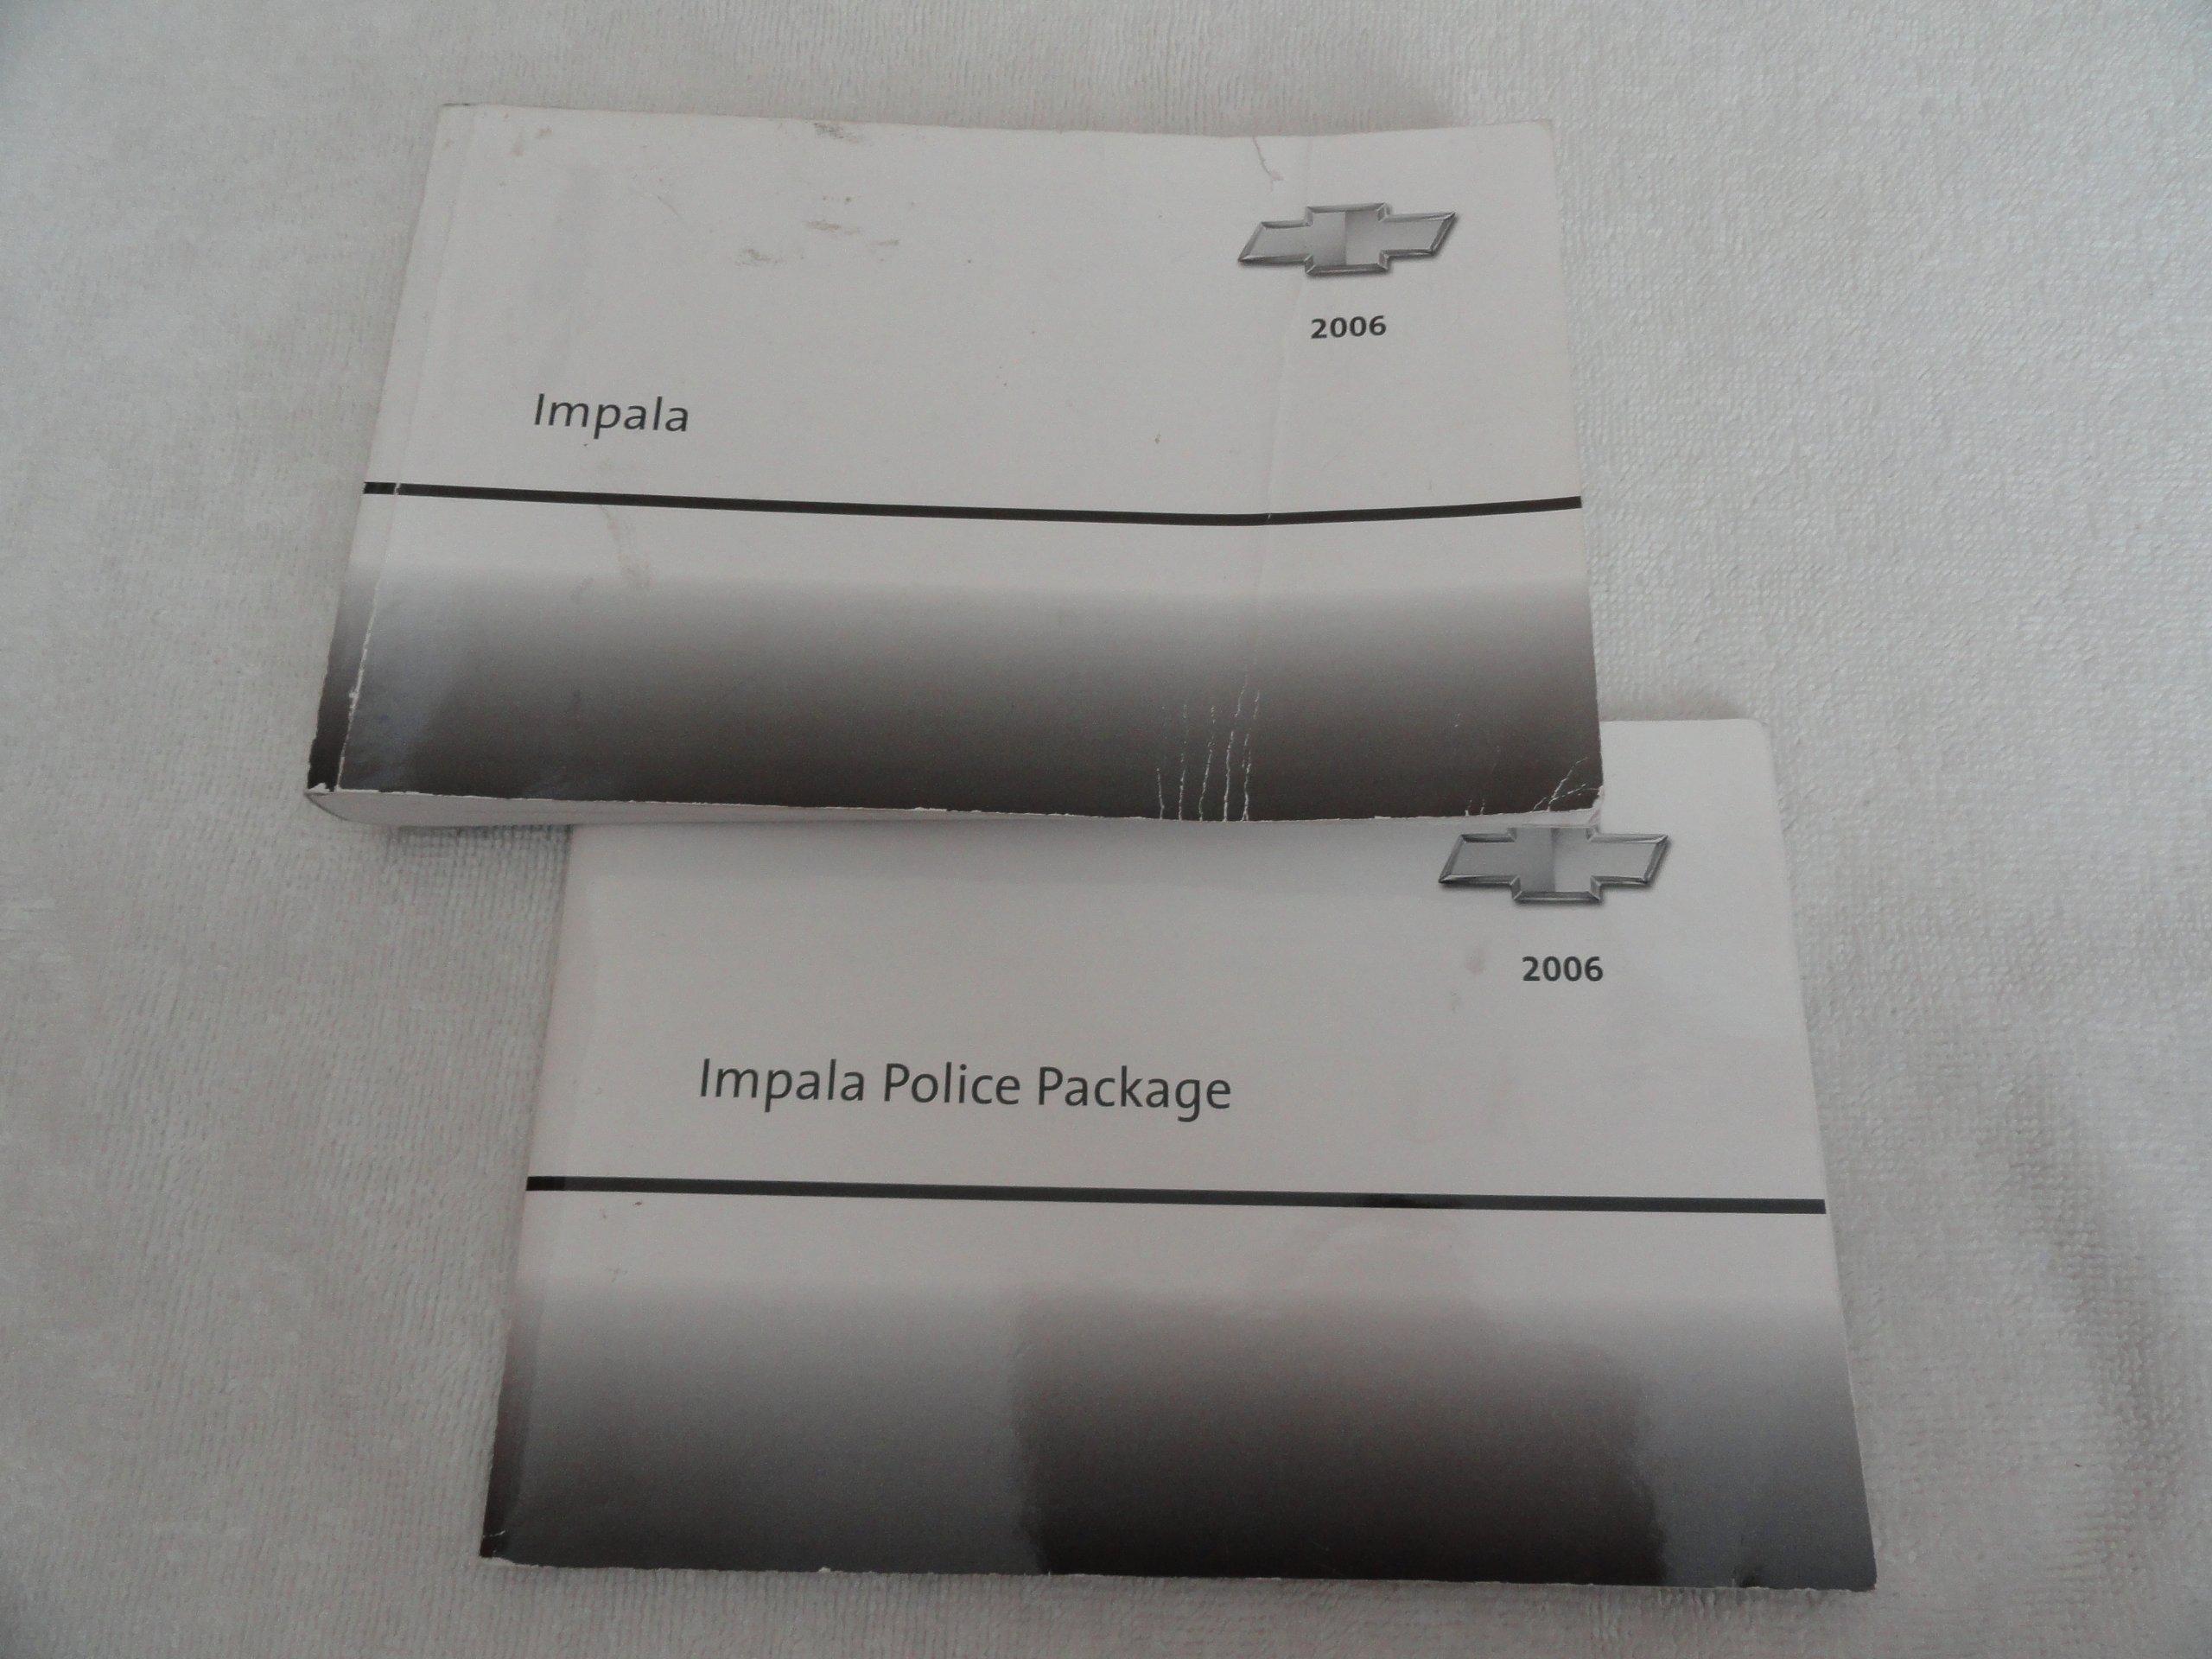 2006 chevrolet impala owners manual chevrolet amazon com books rh amazon com 2015 Chevrolet Impala 2018 Chevrolet Impala